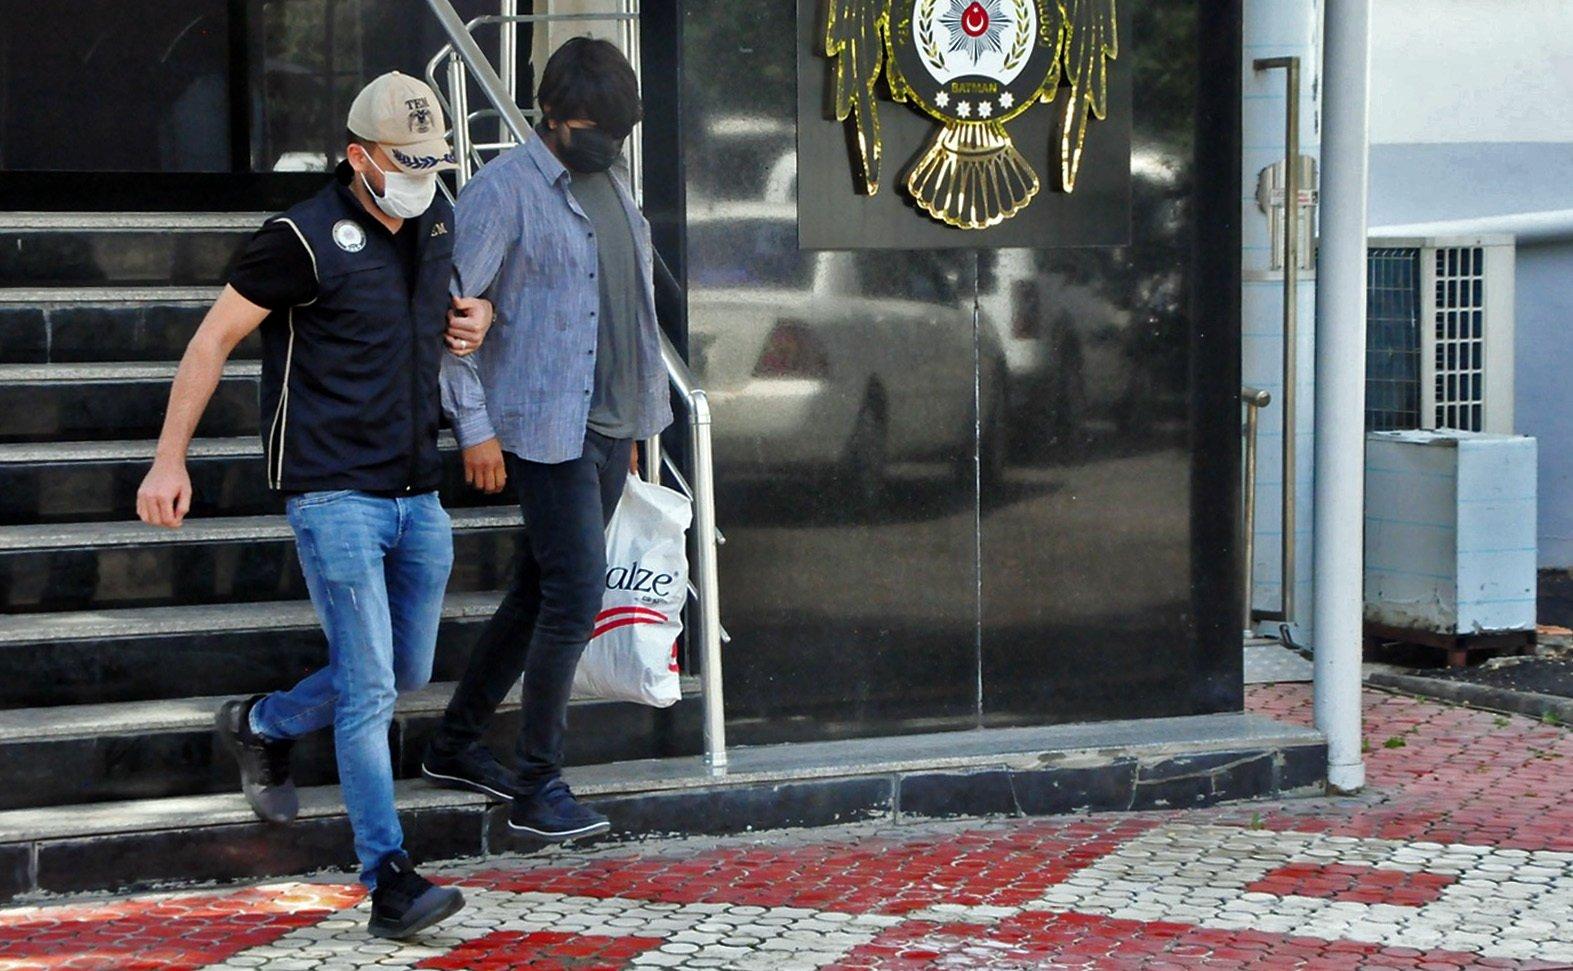 Police escort captured FETÖ suspects, in Batman, eastern Turkey, June 1, 2021. (İHA PHOTO)